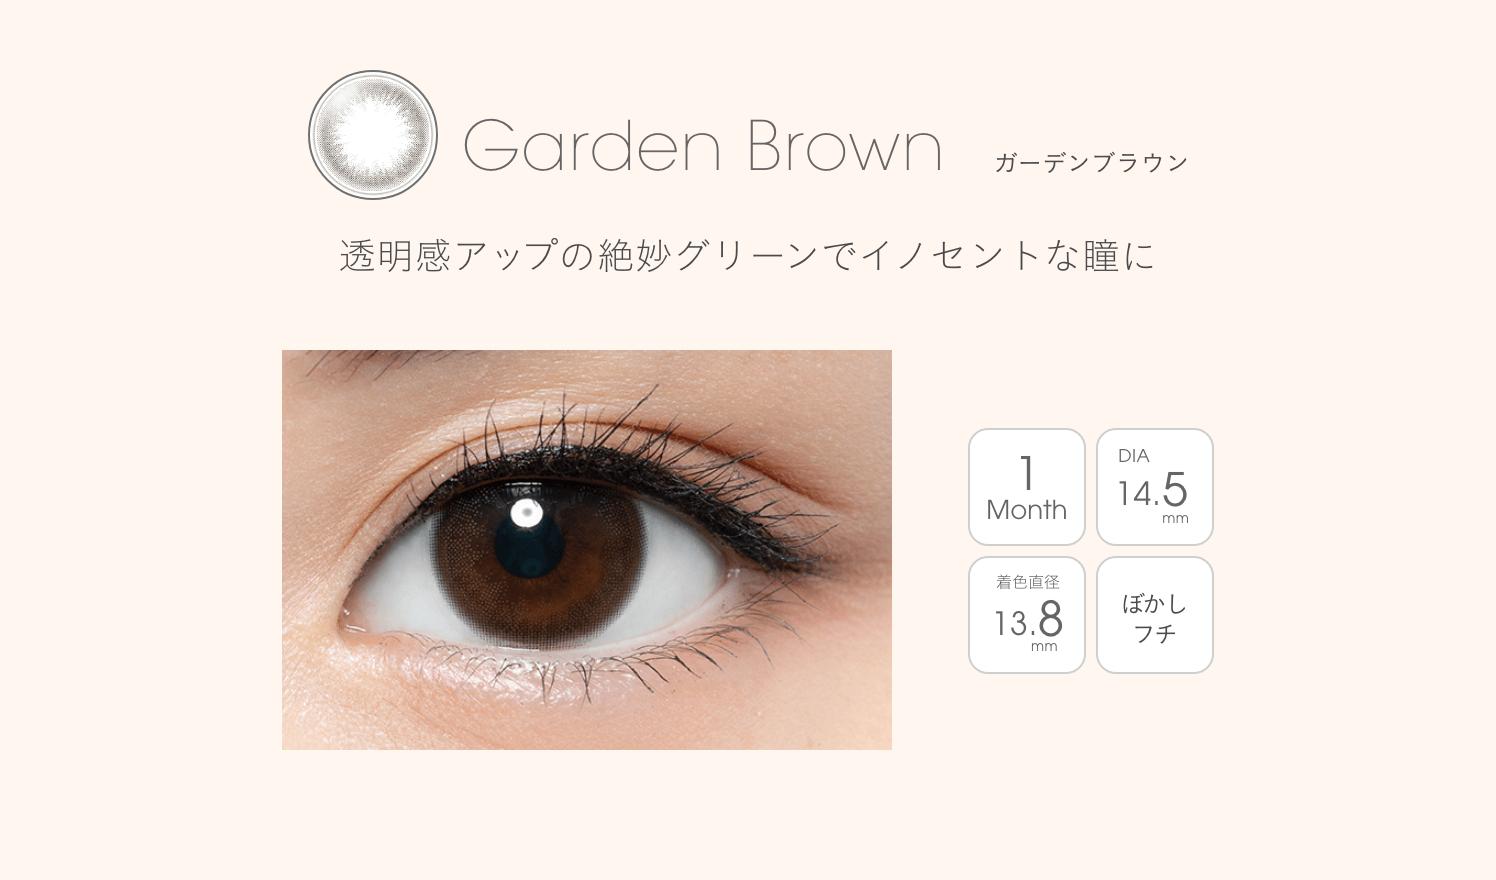 Garden Brown